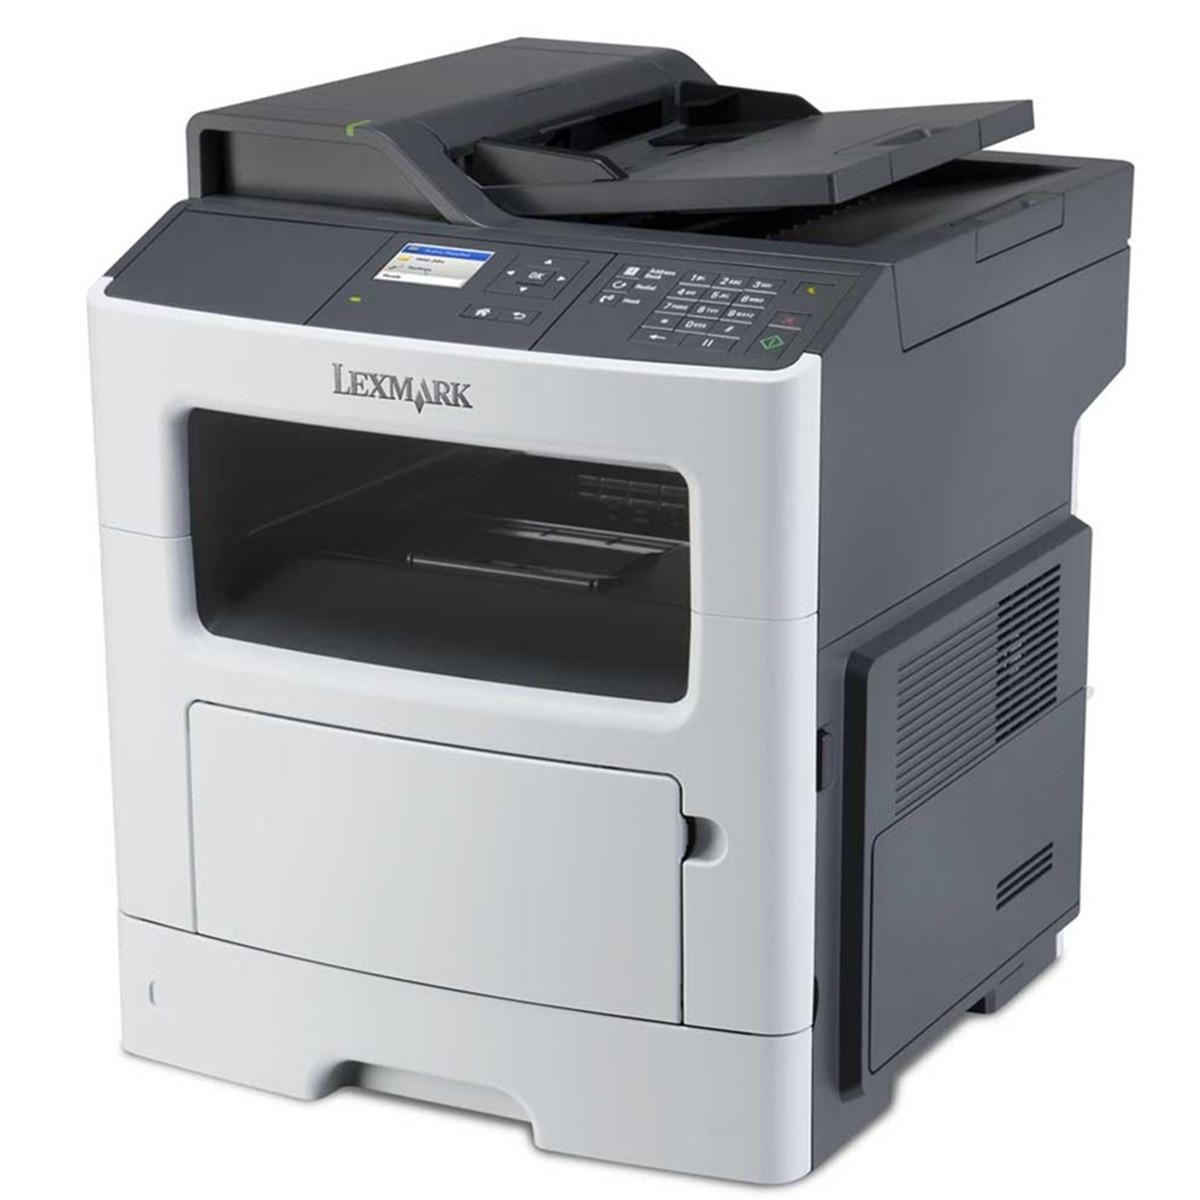 Impressora Lexmark MX317DN MX317 Multifuncional Laser Monocromática com Rede e Duplex